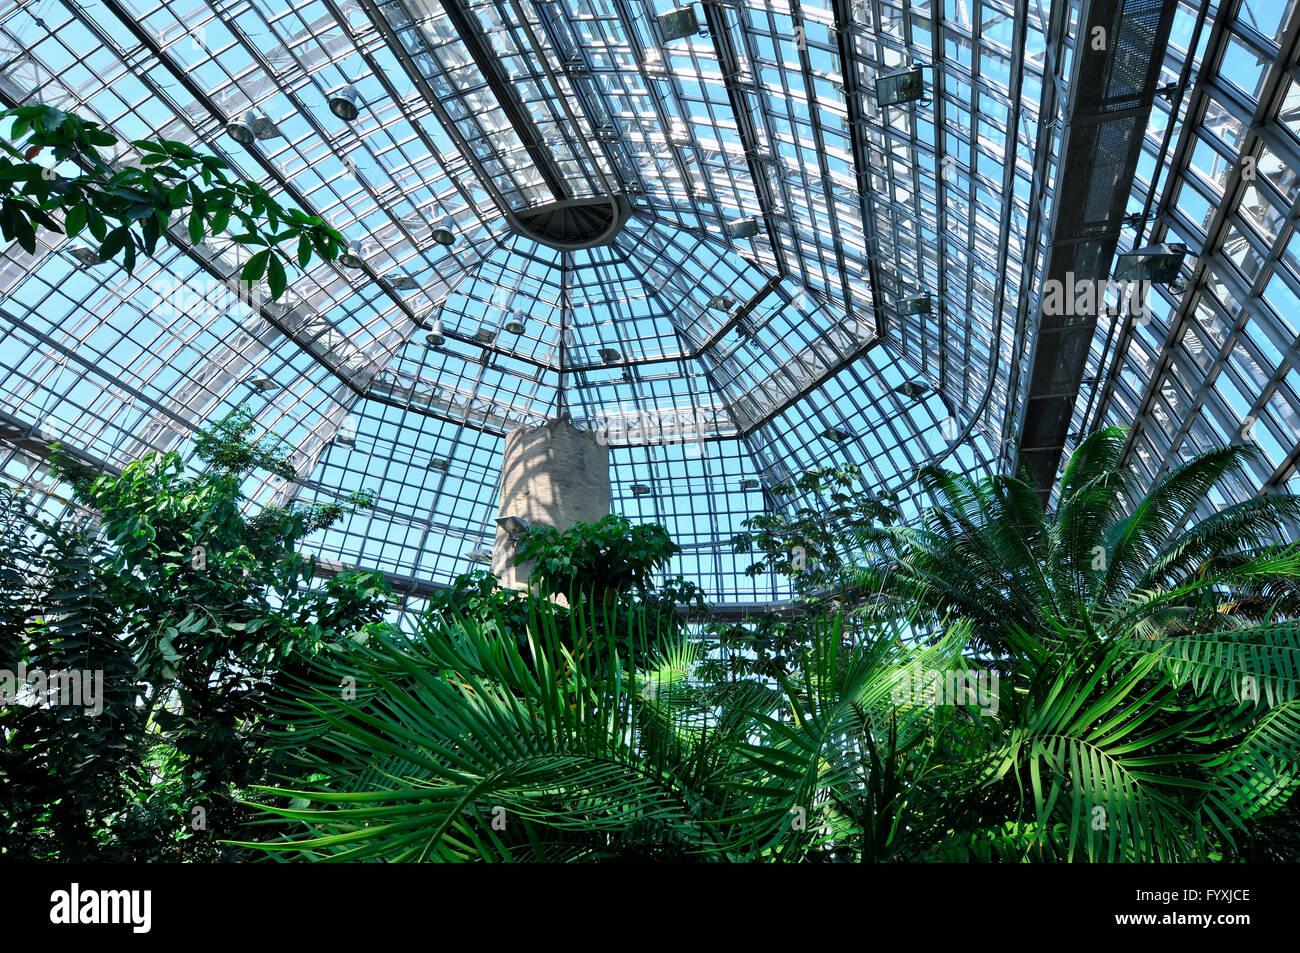 Great Greenhouse, Grosses Tropenhaus, Botanical Garden, Dahlem, Berlin,  Germany